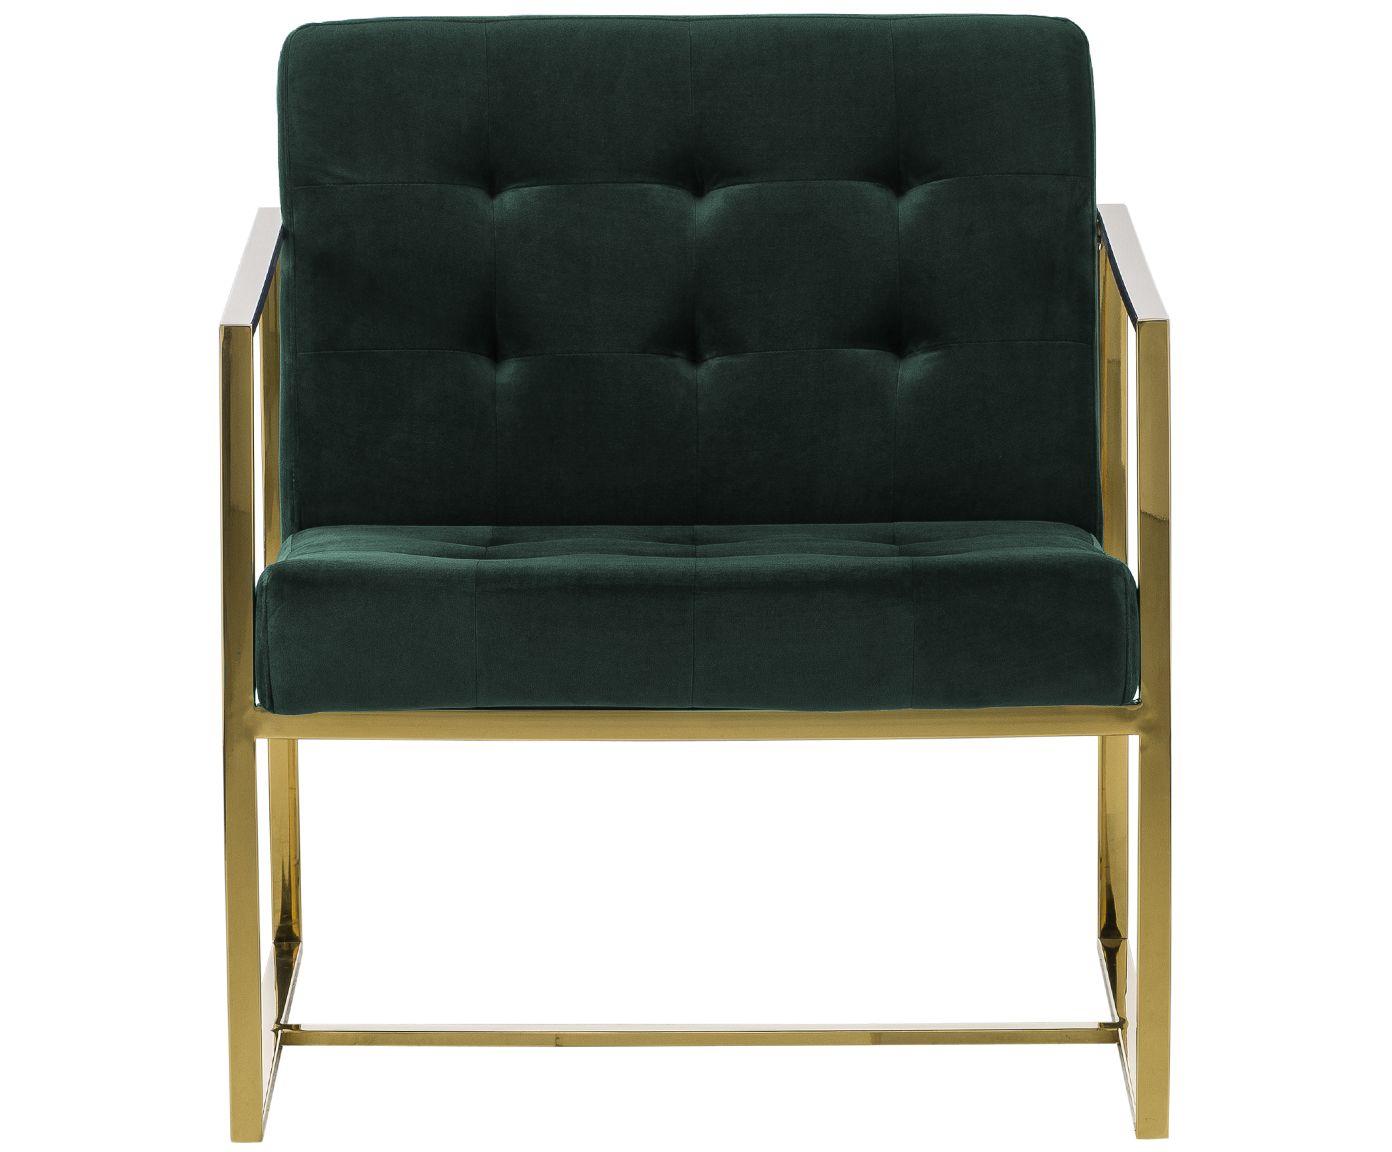 Sedia a poltrona in velluto verde Manhattan | WestwingNow ...